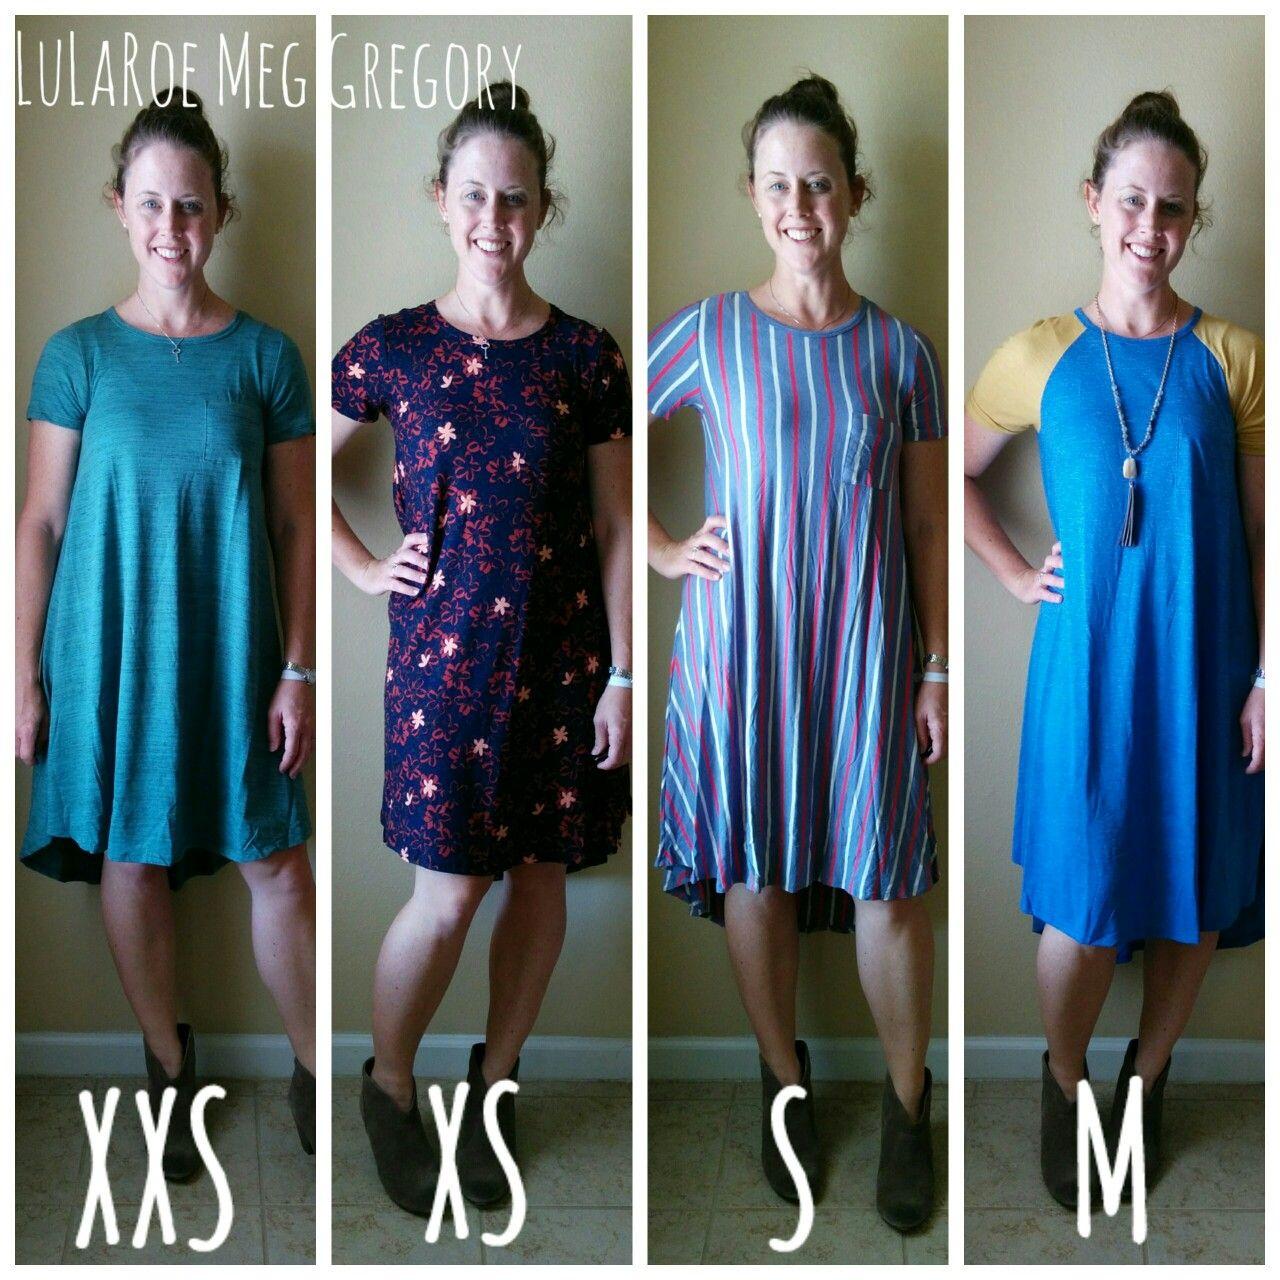 Lularoe Carly Dress This Is How Sizes Xxs Medium Fit On Me Street